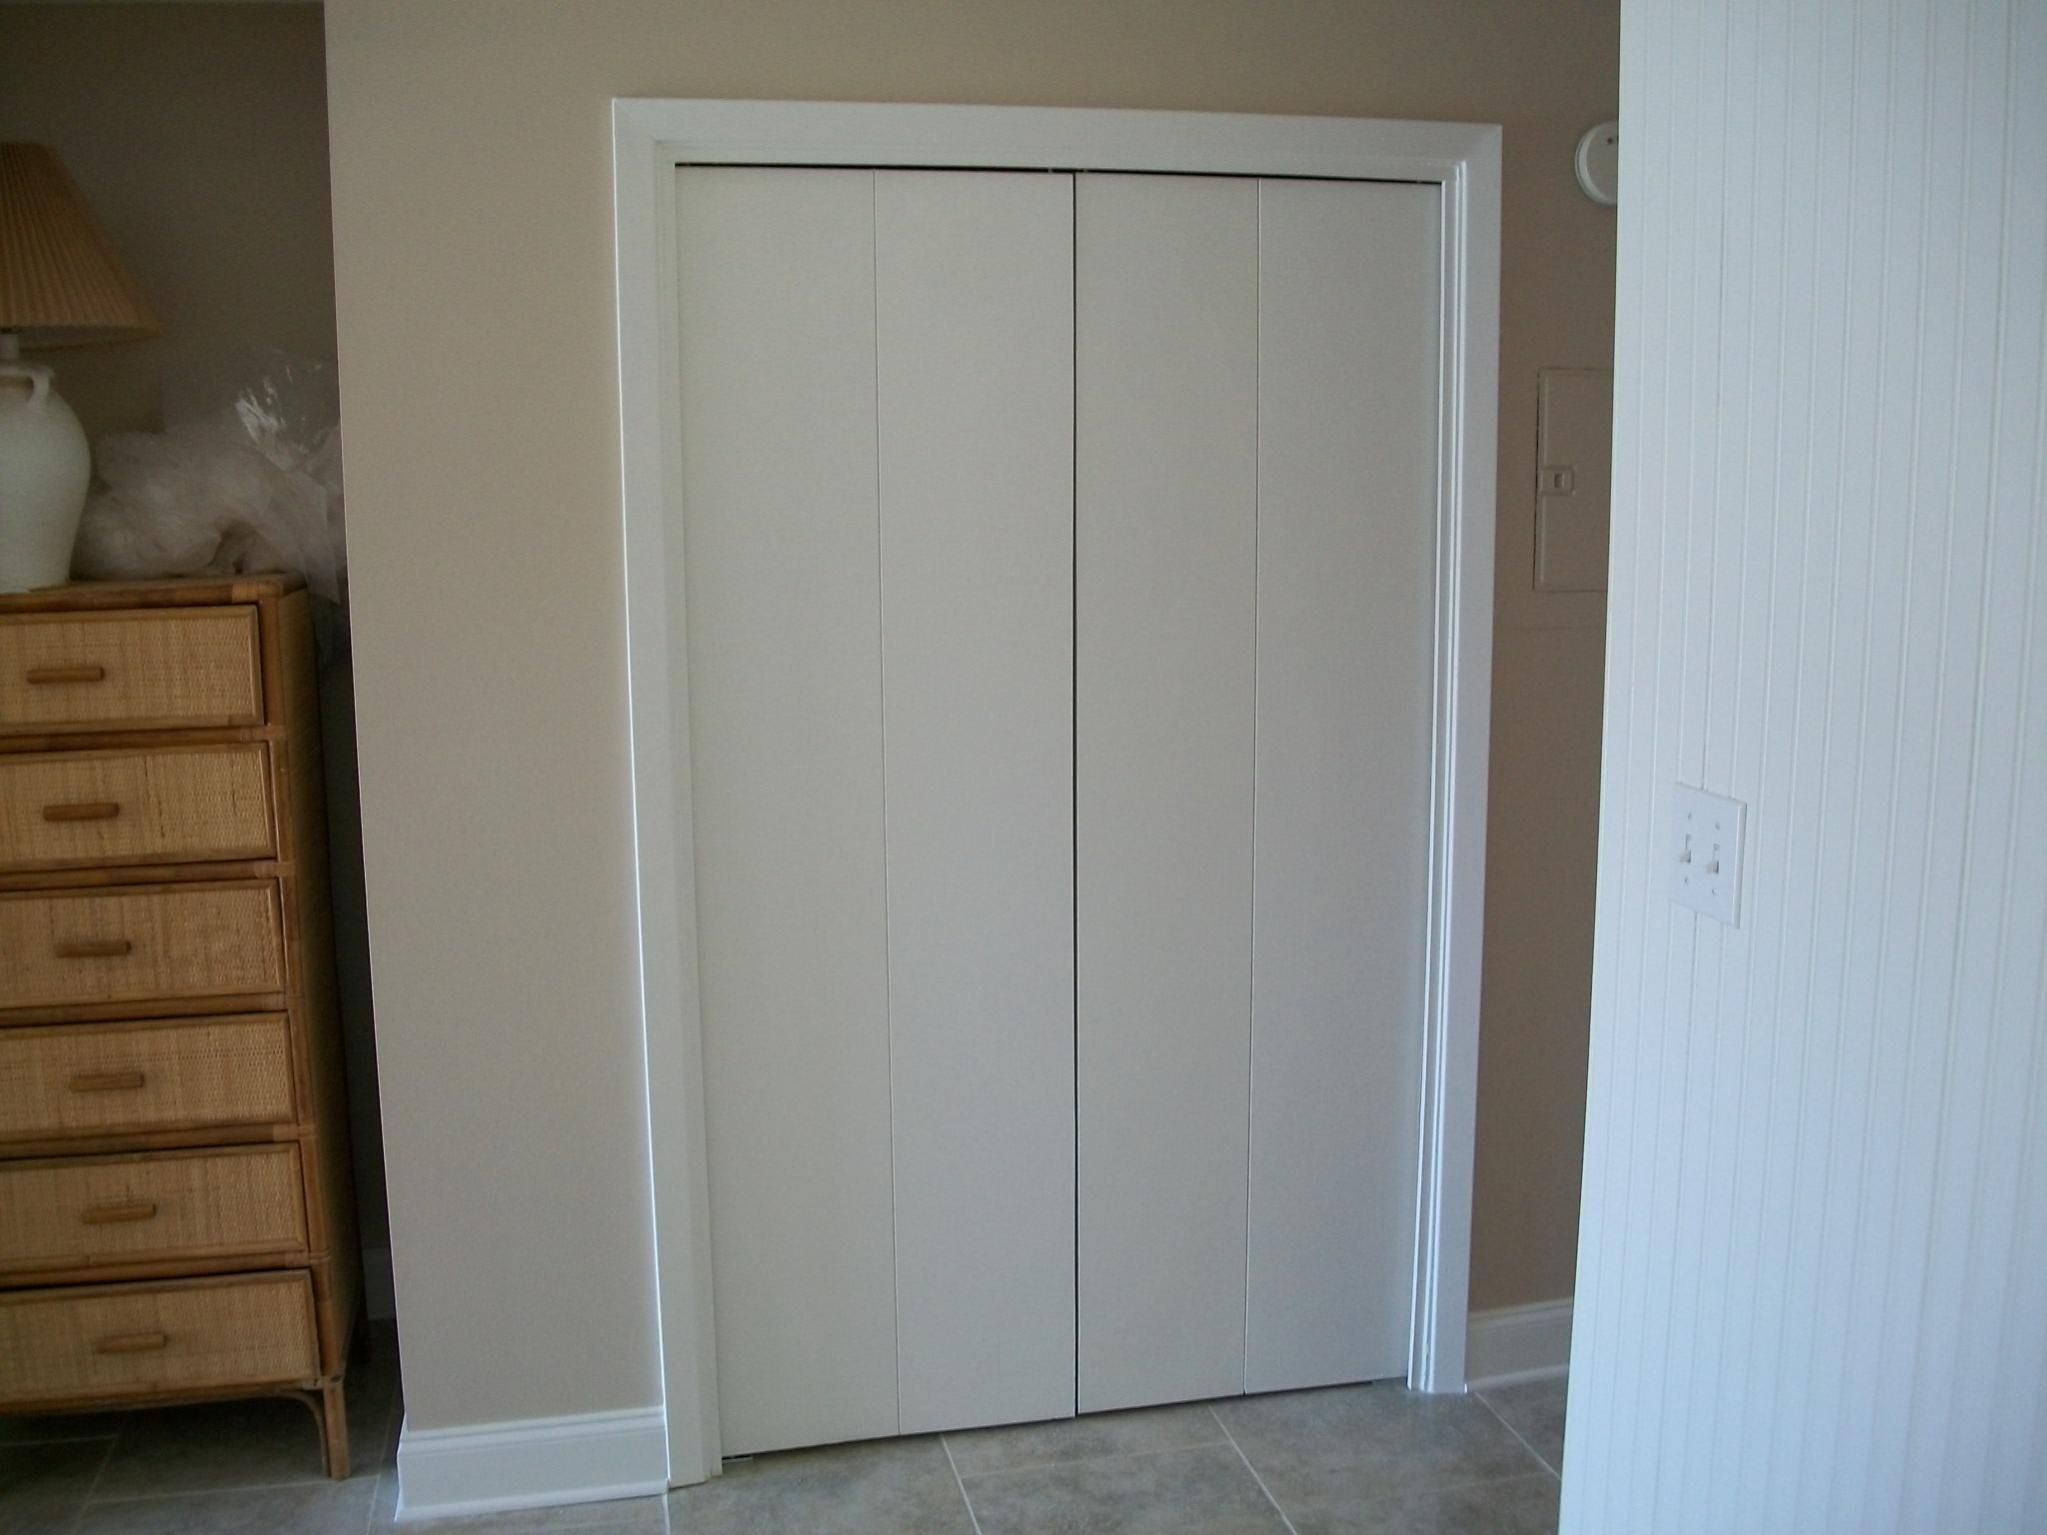 Drywall Closet Door Trim Pinterest